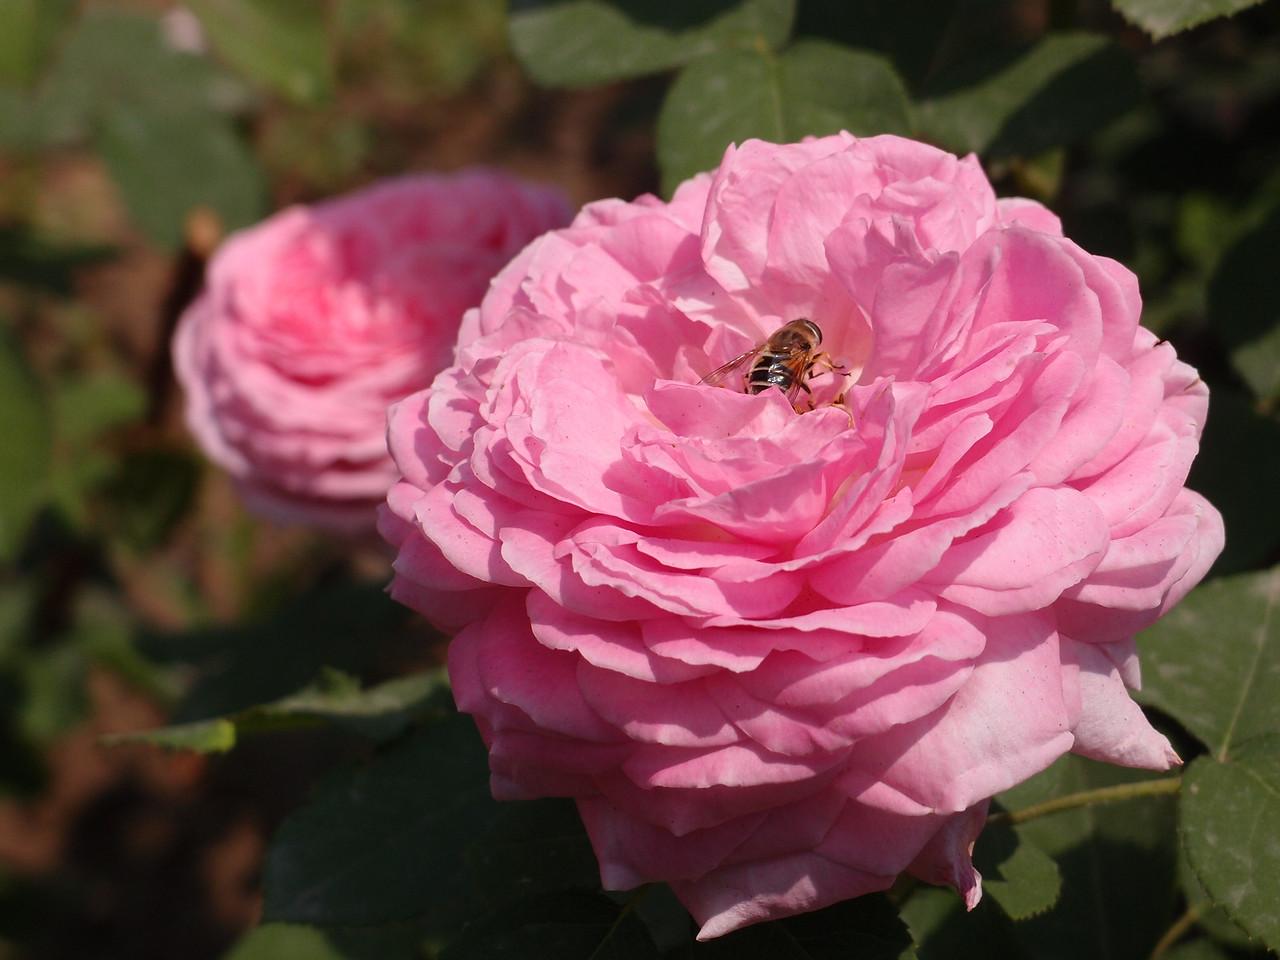 20120515_1124_0486 roses